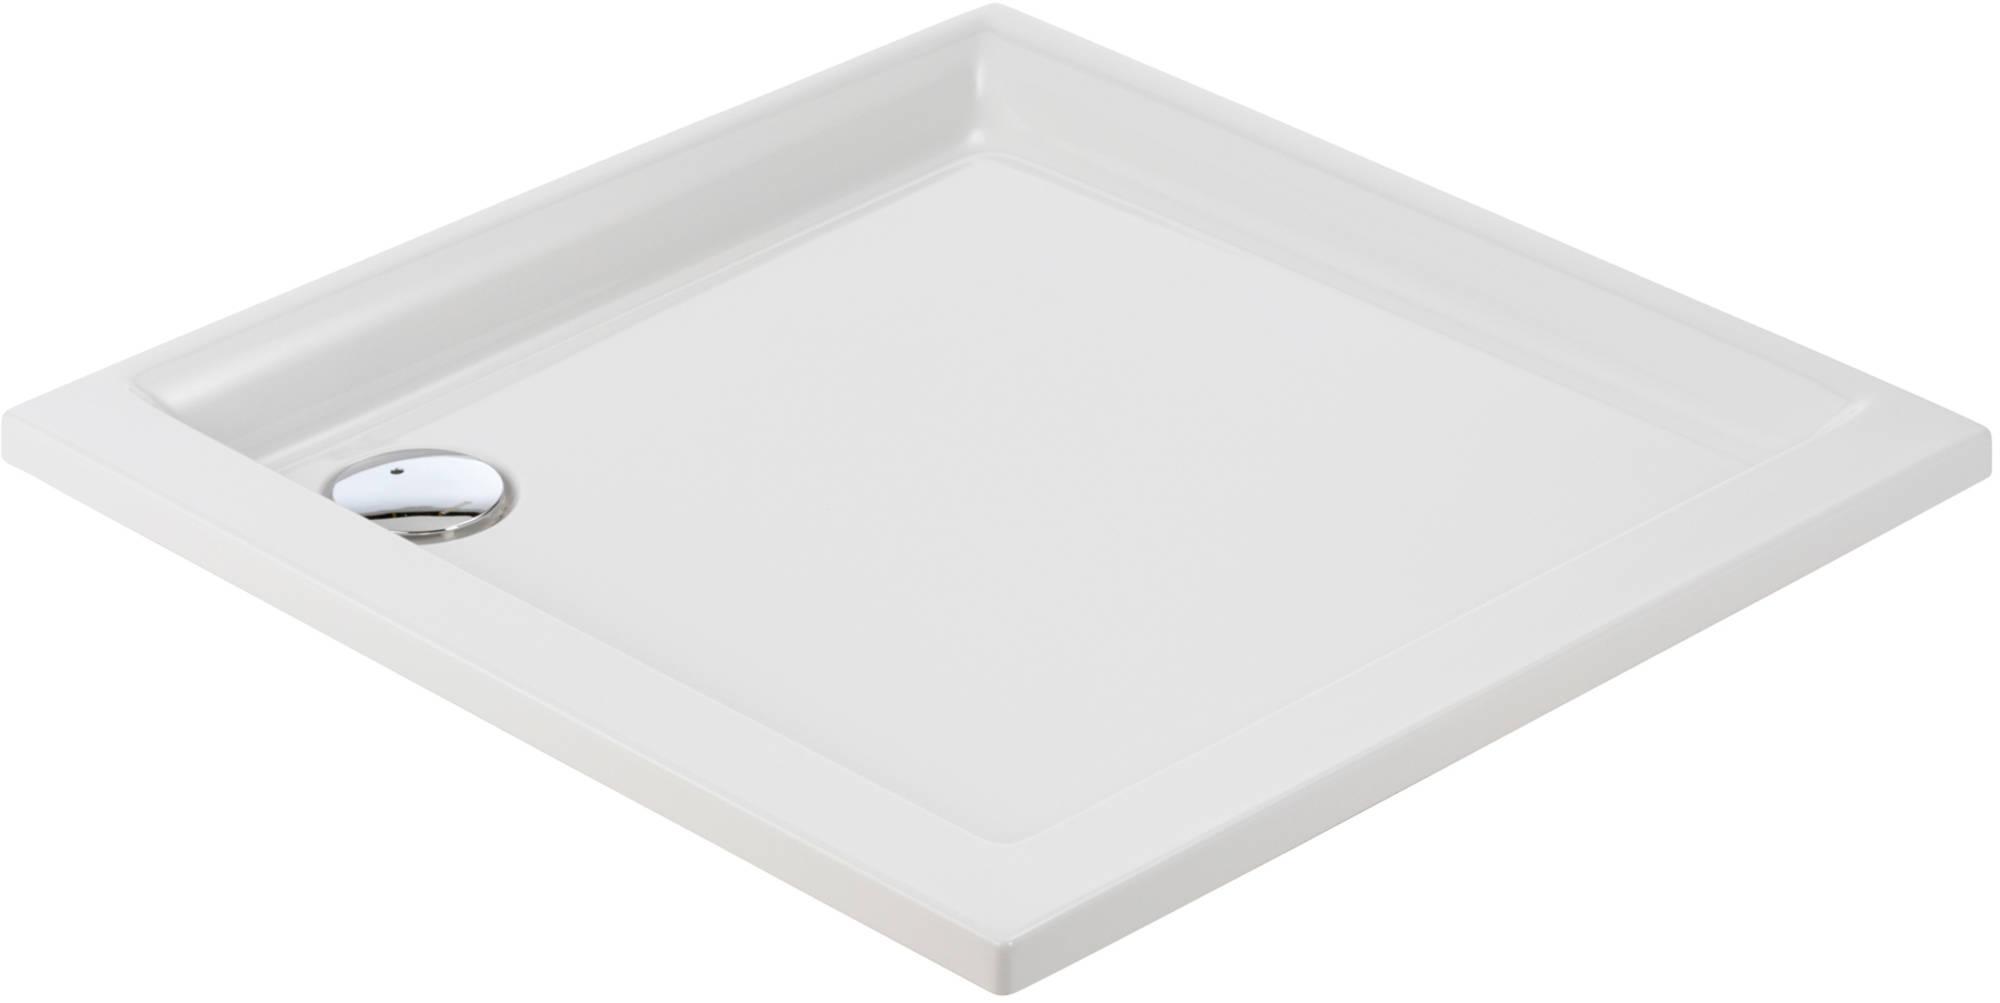 Sealskin Senso douchebak vierkant 90x90cm inbouw, wit